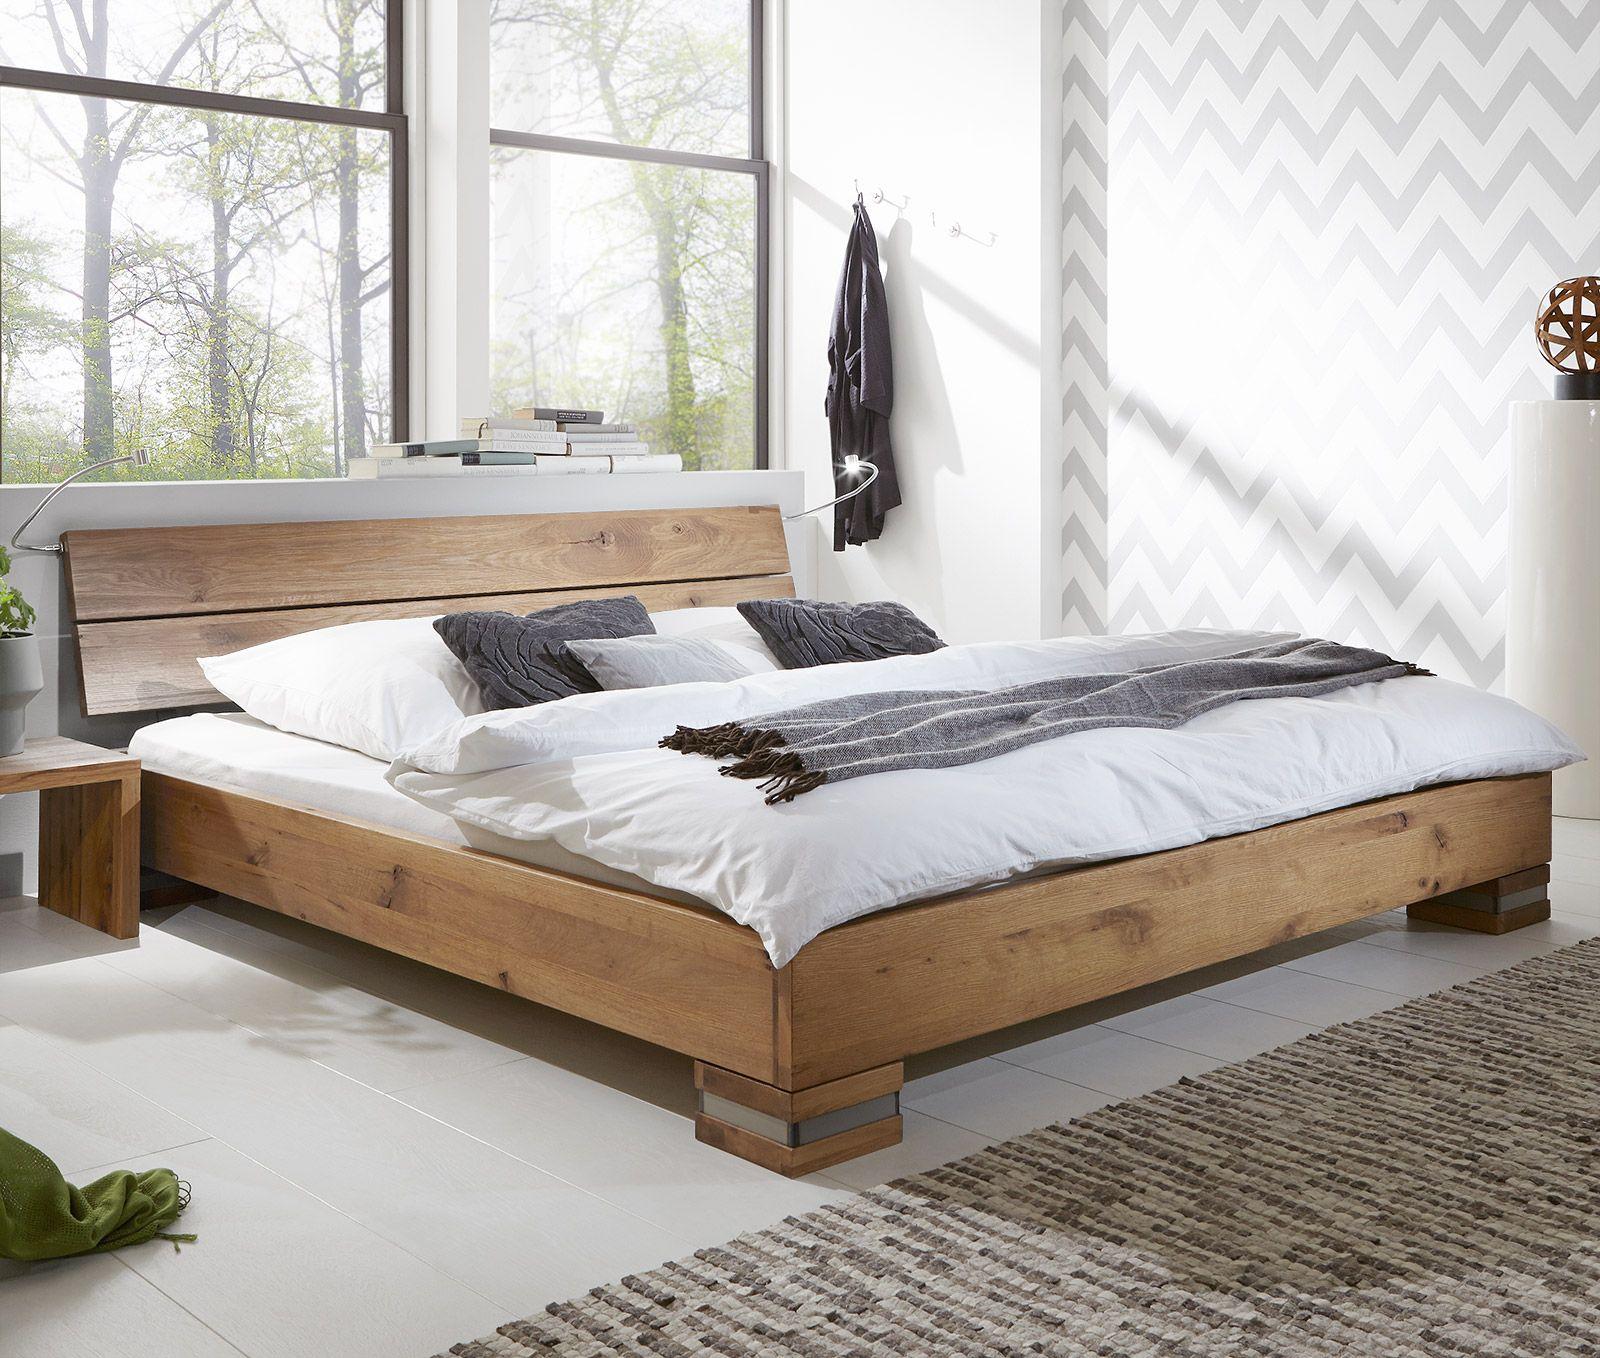 massivholzbett curada in tollem design wildeiche natur futon bedroombed - Futon Bedroom Ideas